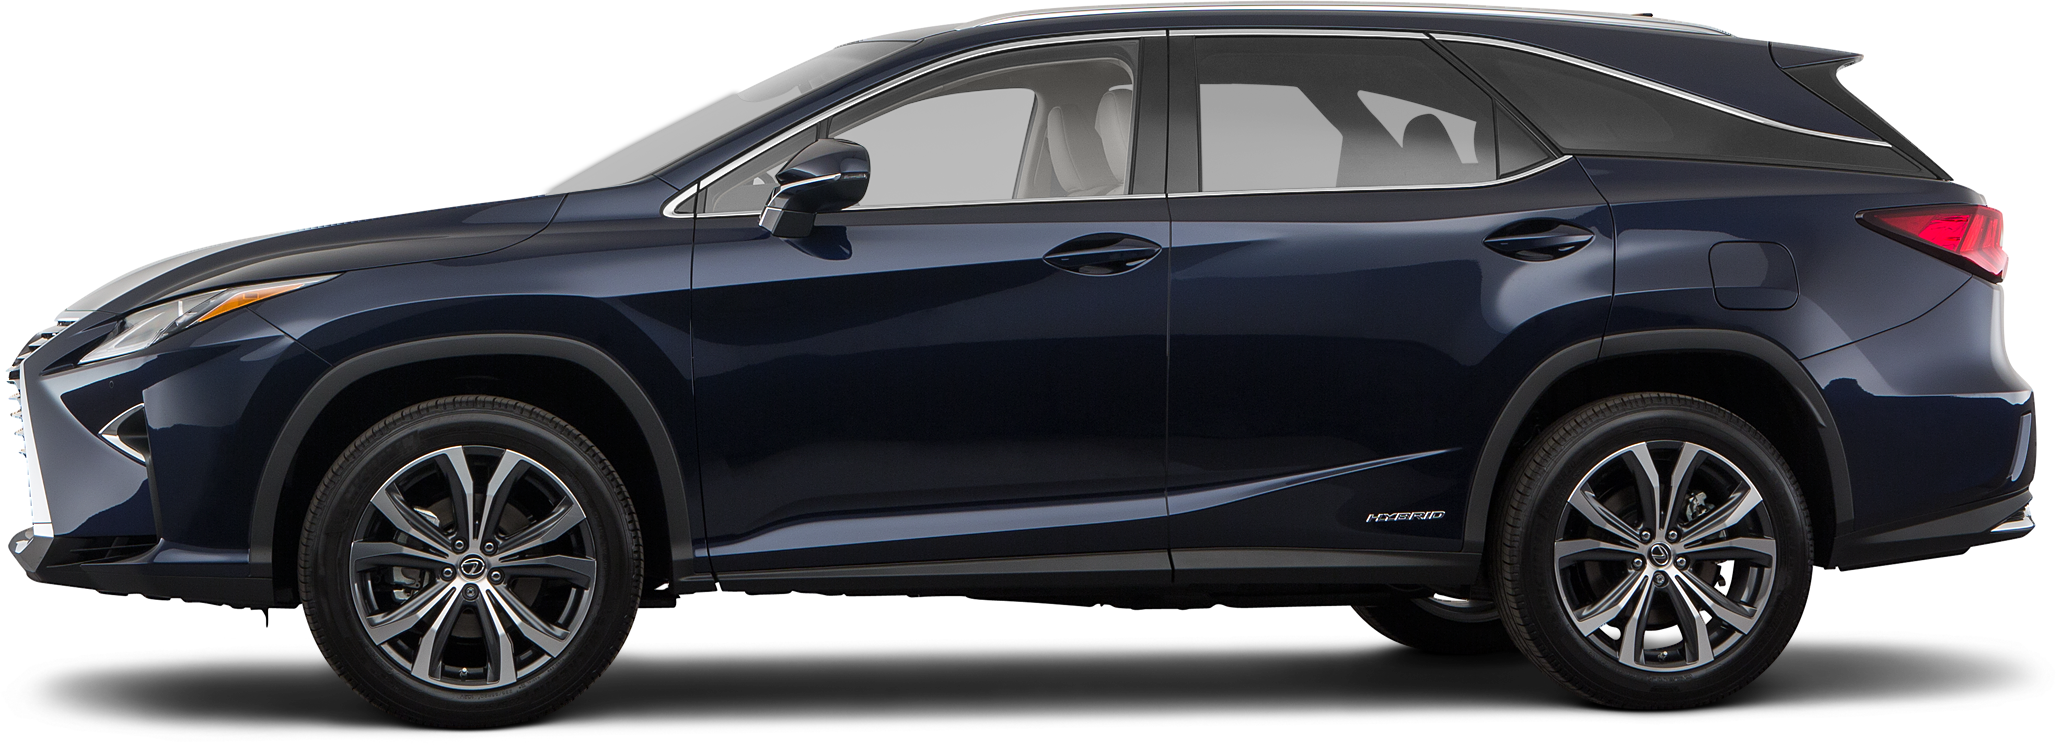 2018 Lexus RX 450hL SUV Luxury